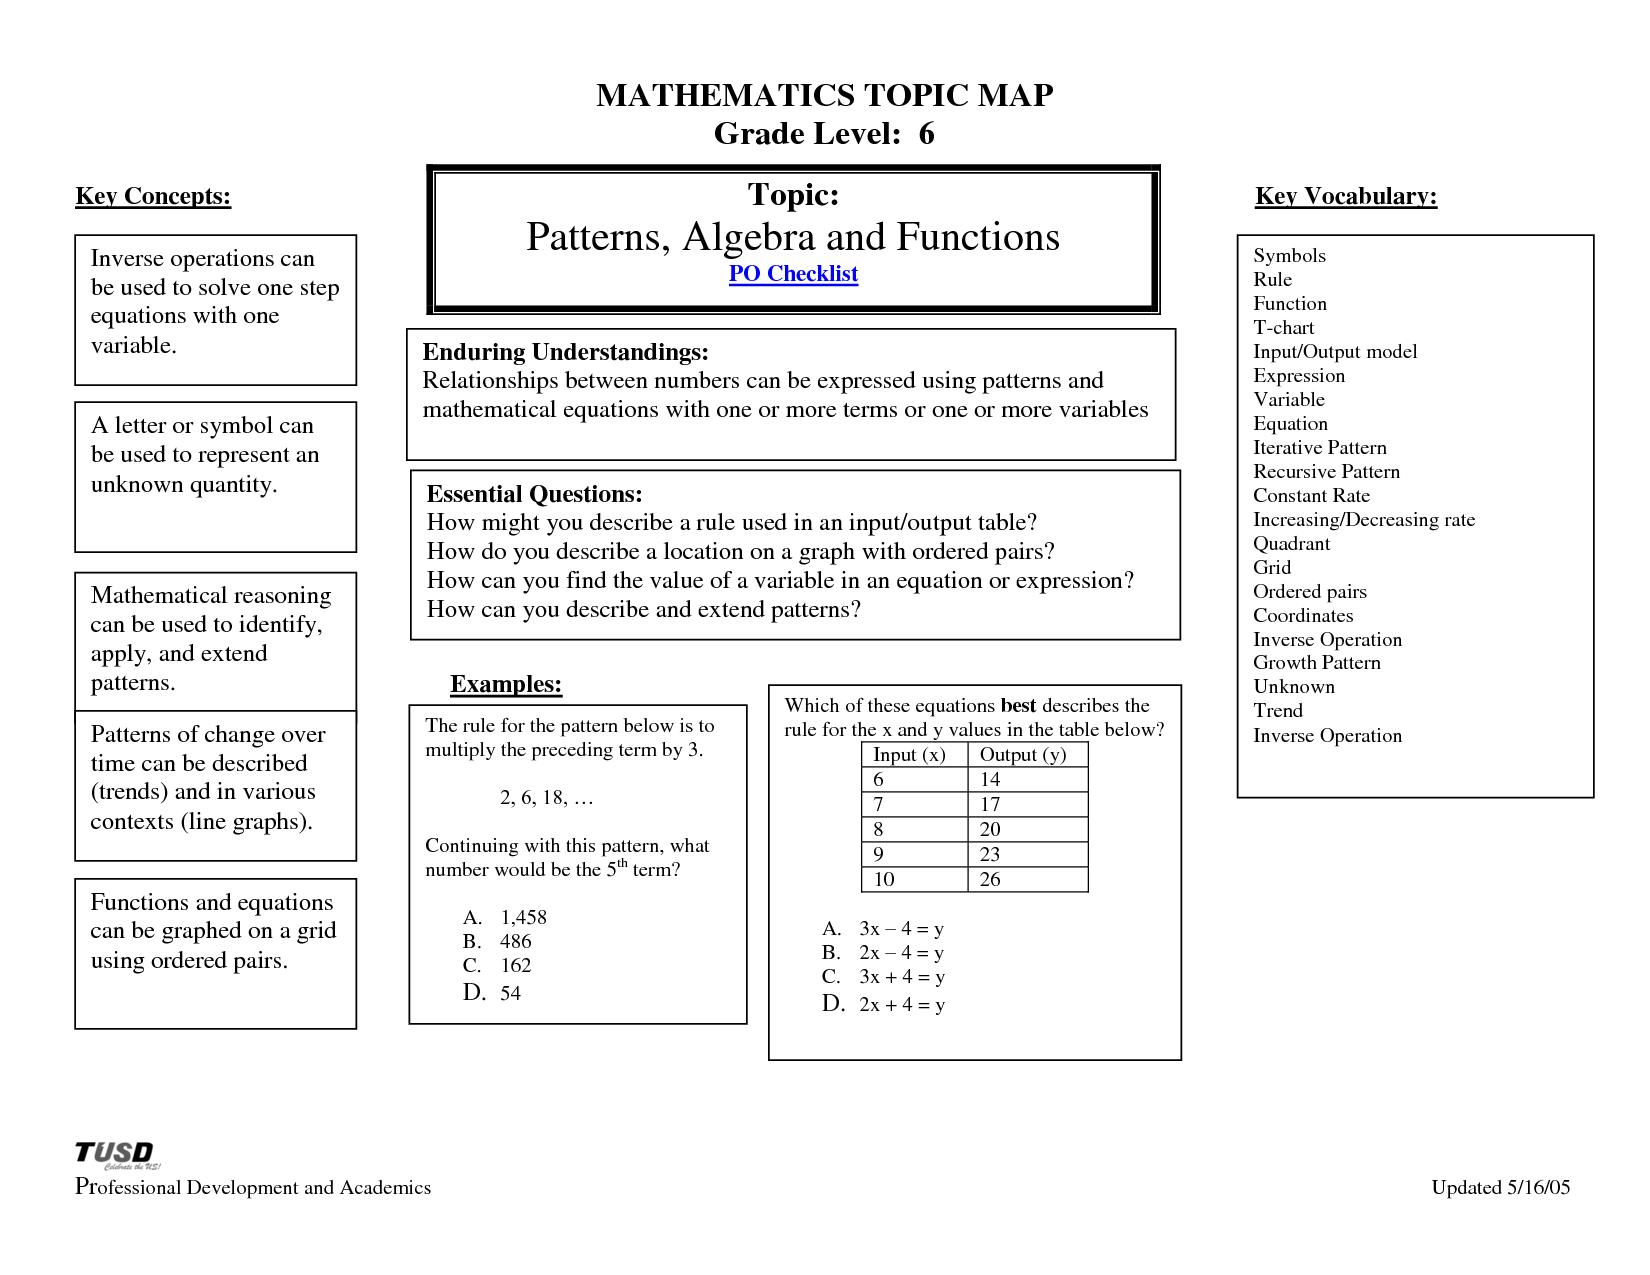 Algebraic Equations Chart Mathematics Concept Map Algebra Interactive Notebooks Algebra Equations Mathematical Equations [ 1275 x 1650 Pixel ]